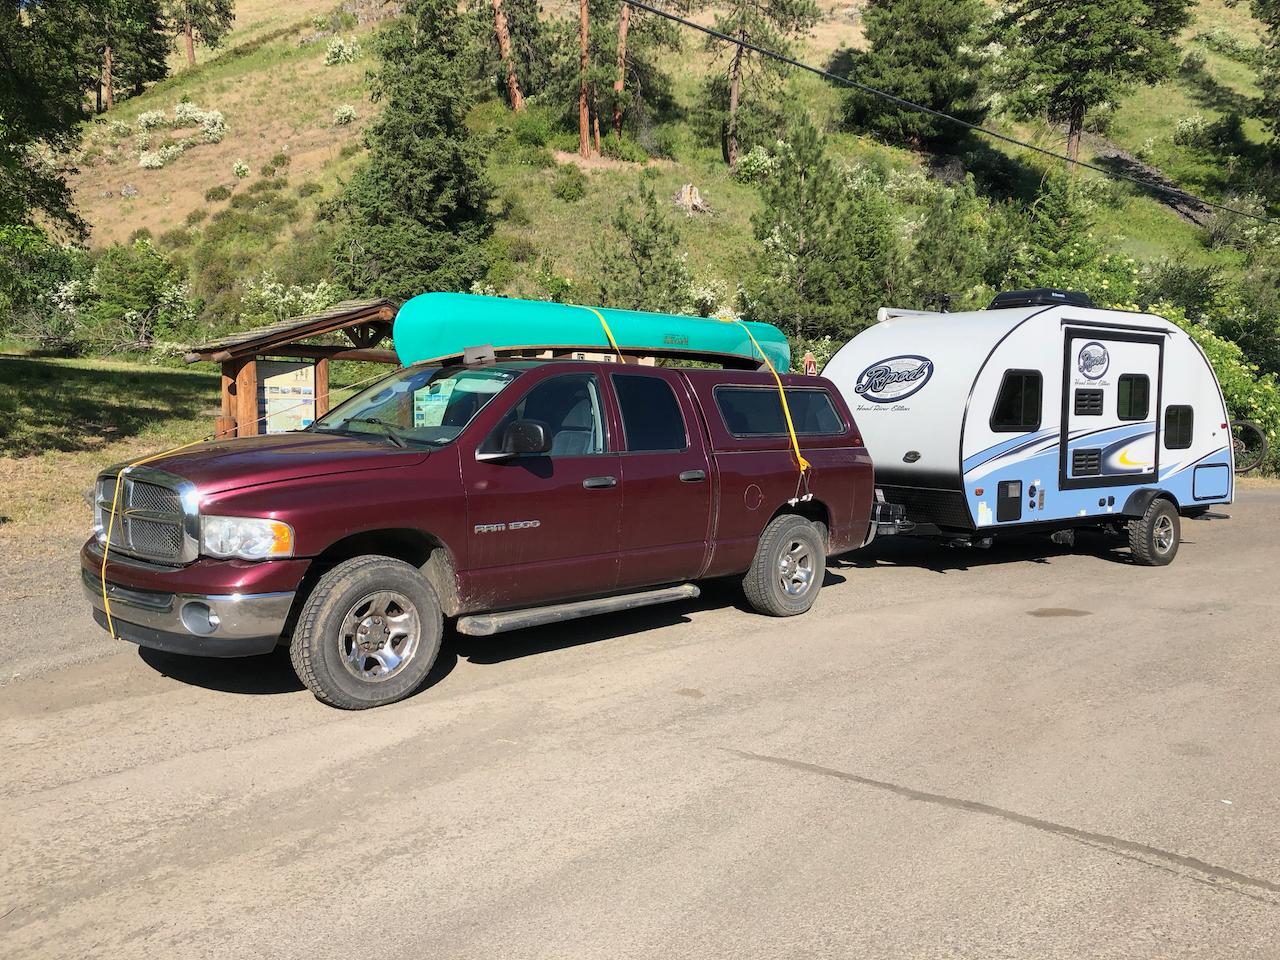 RAM 1500 with R-Pod in Wallowa County. R-Pod RP 182G 2017